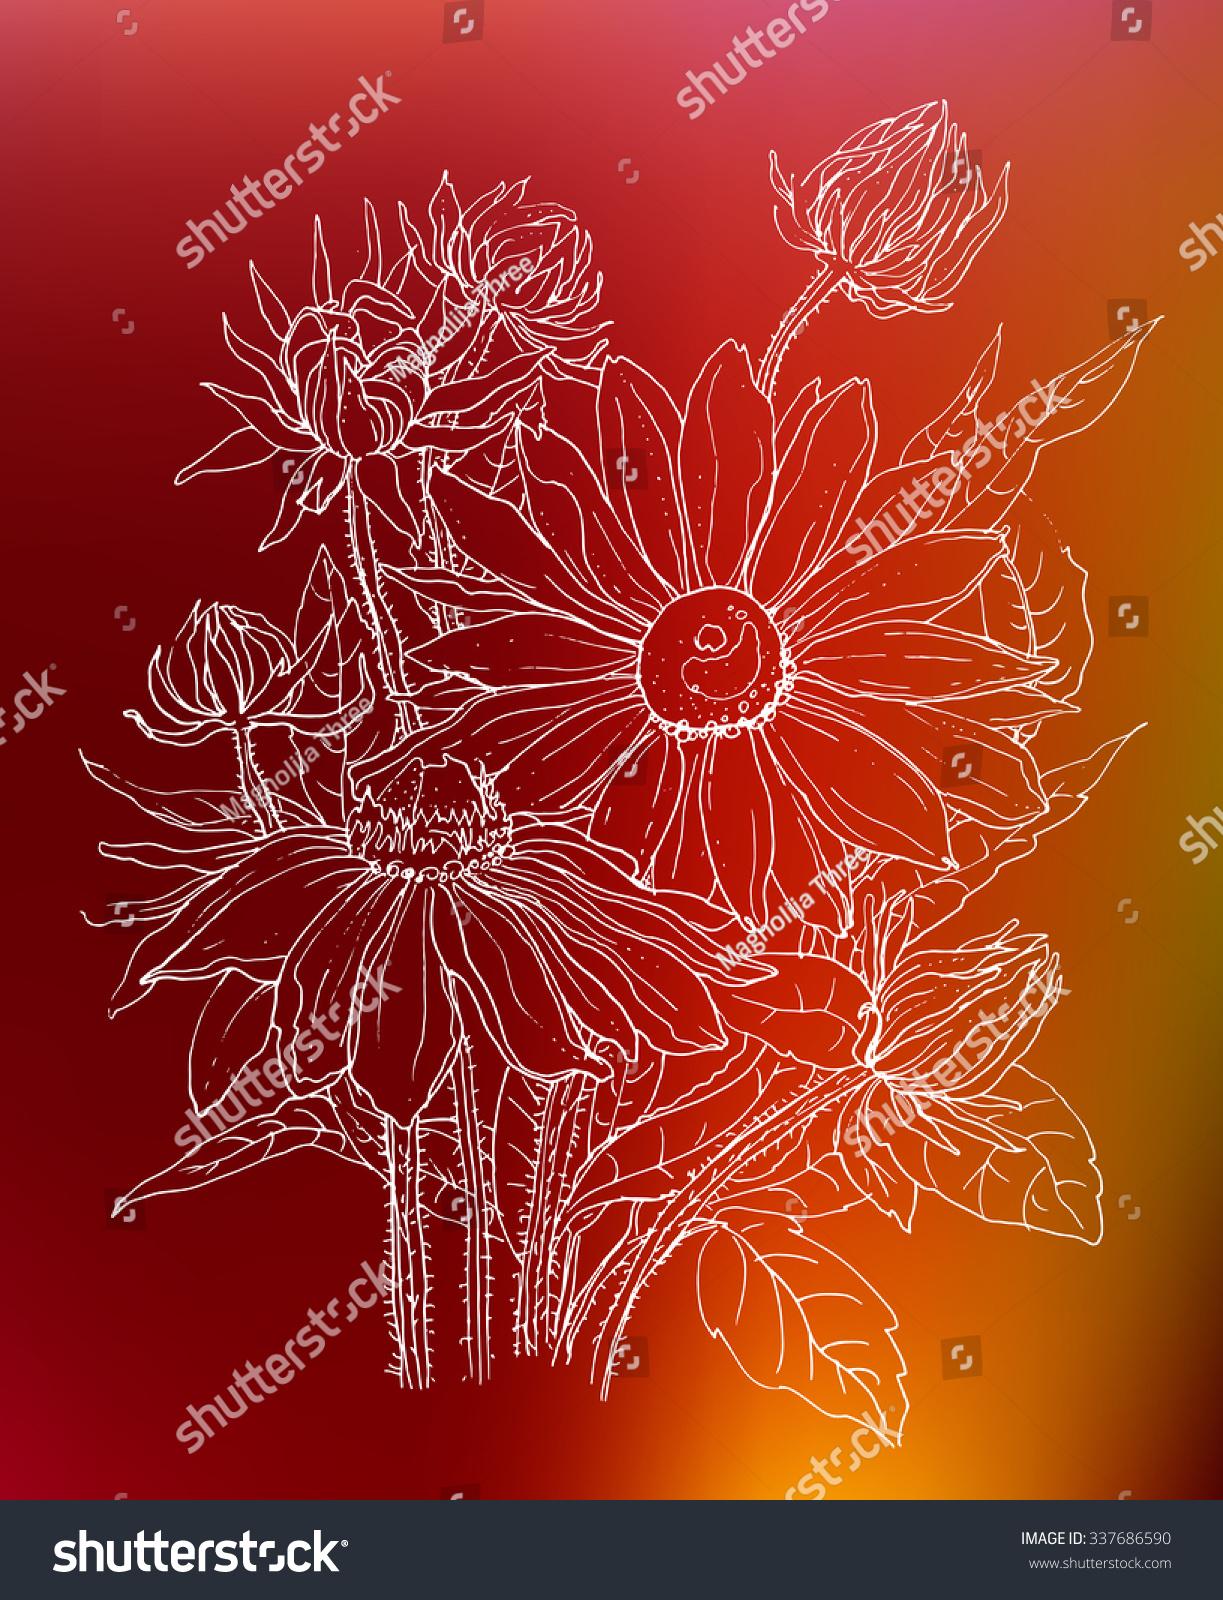 Daisy Flowers Bouquet Botanical Outline Illustration Stock Vector ...